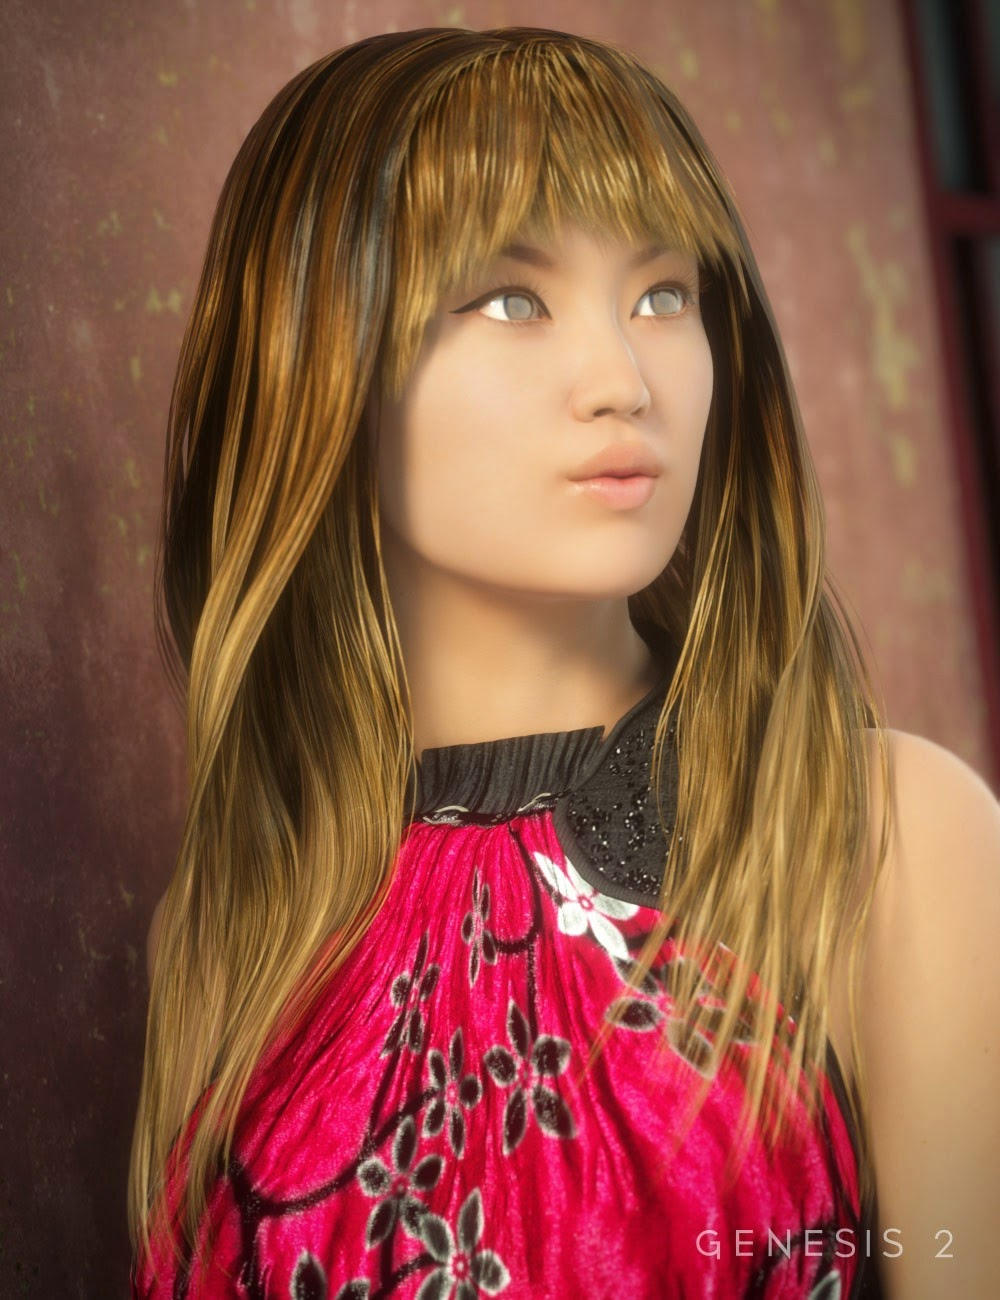 Choko cheveux pour Genesis 2 Femme